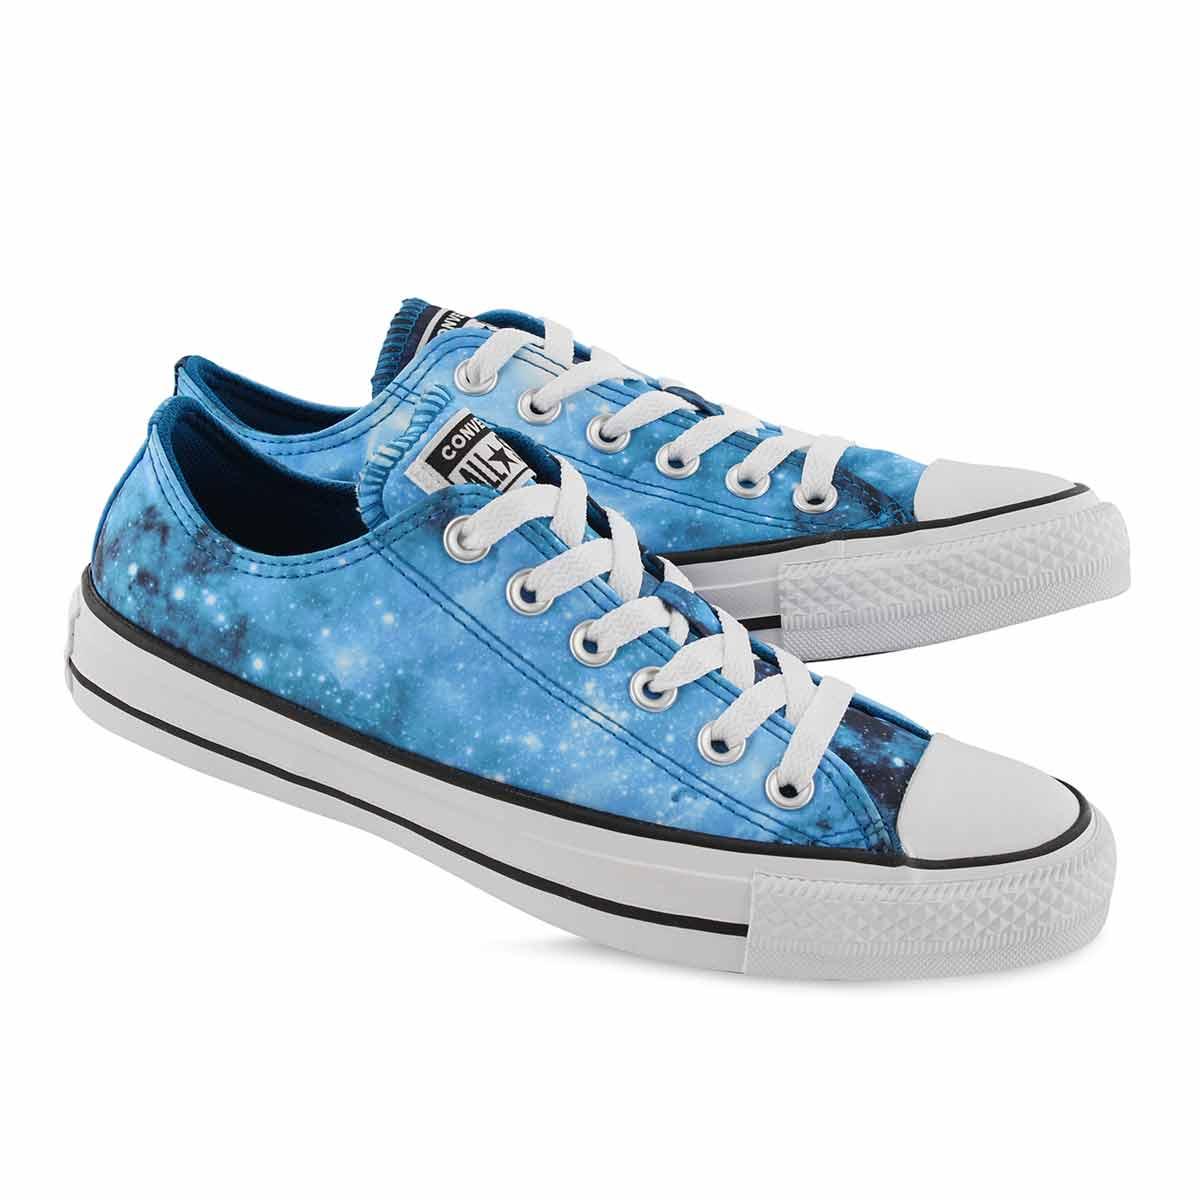 Converse-Women-039-s-Chuck-Taylor-All-Star-Miss-Galaxy-Ox-Sneaker miniature 8